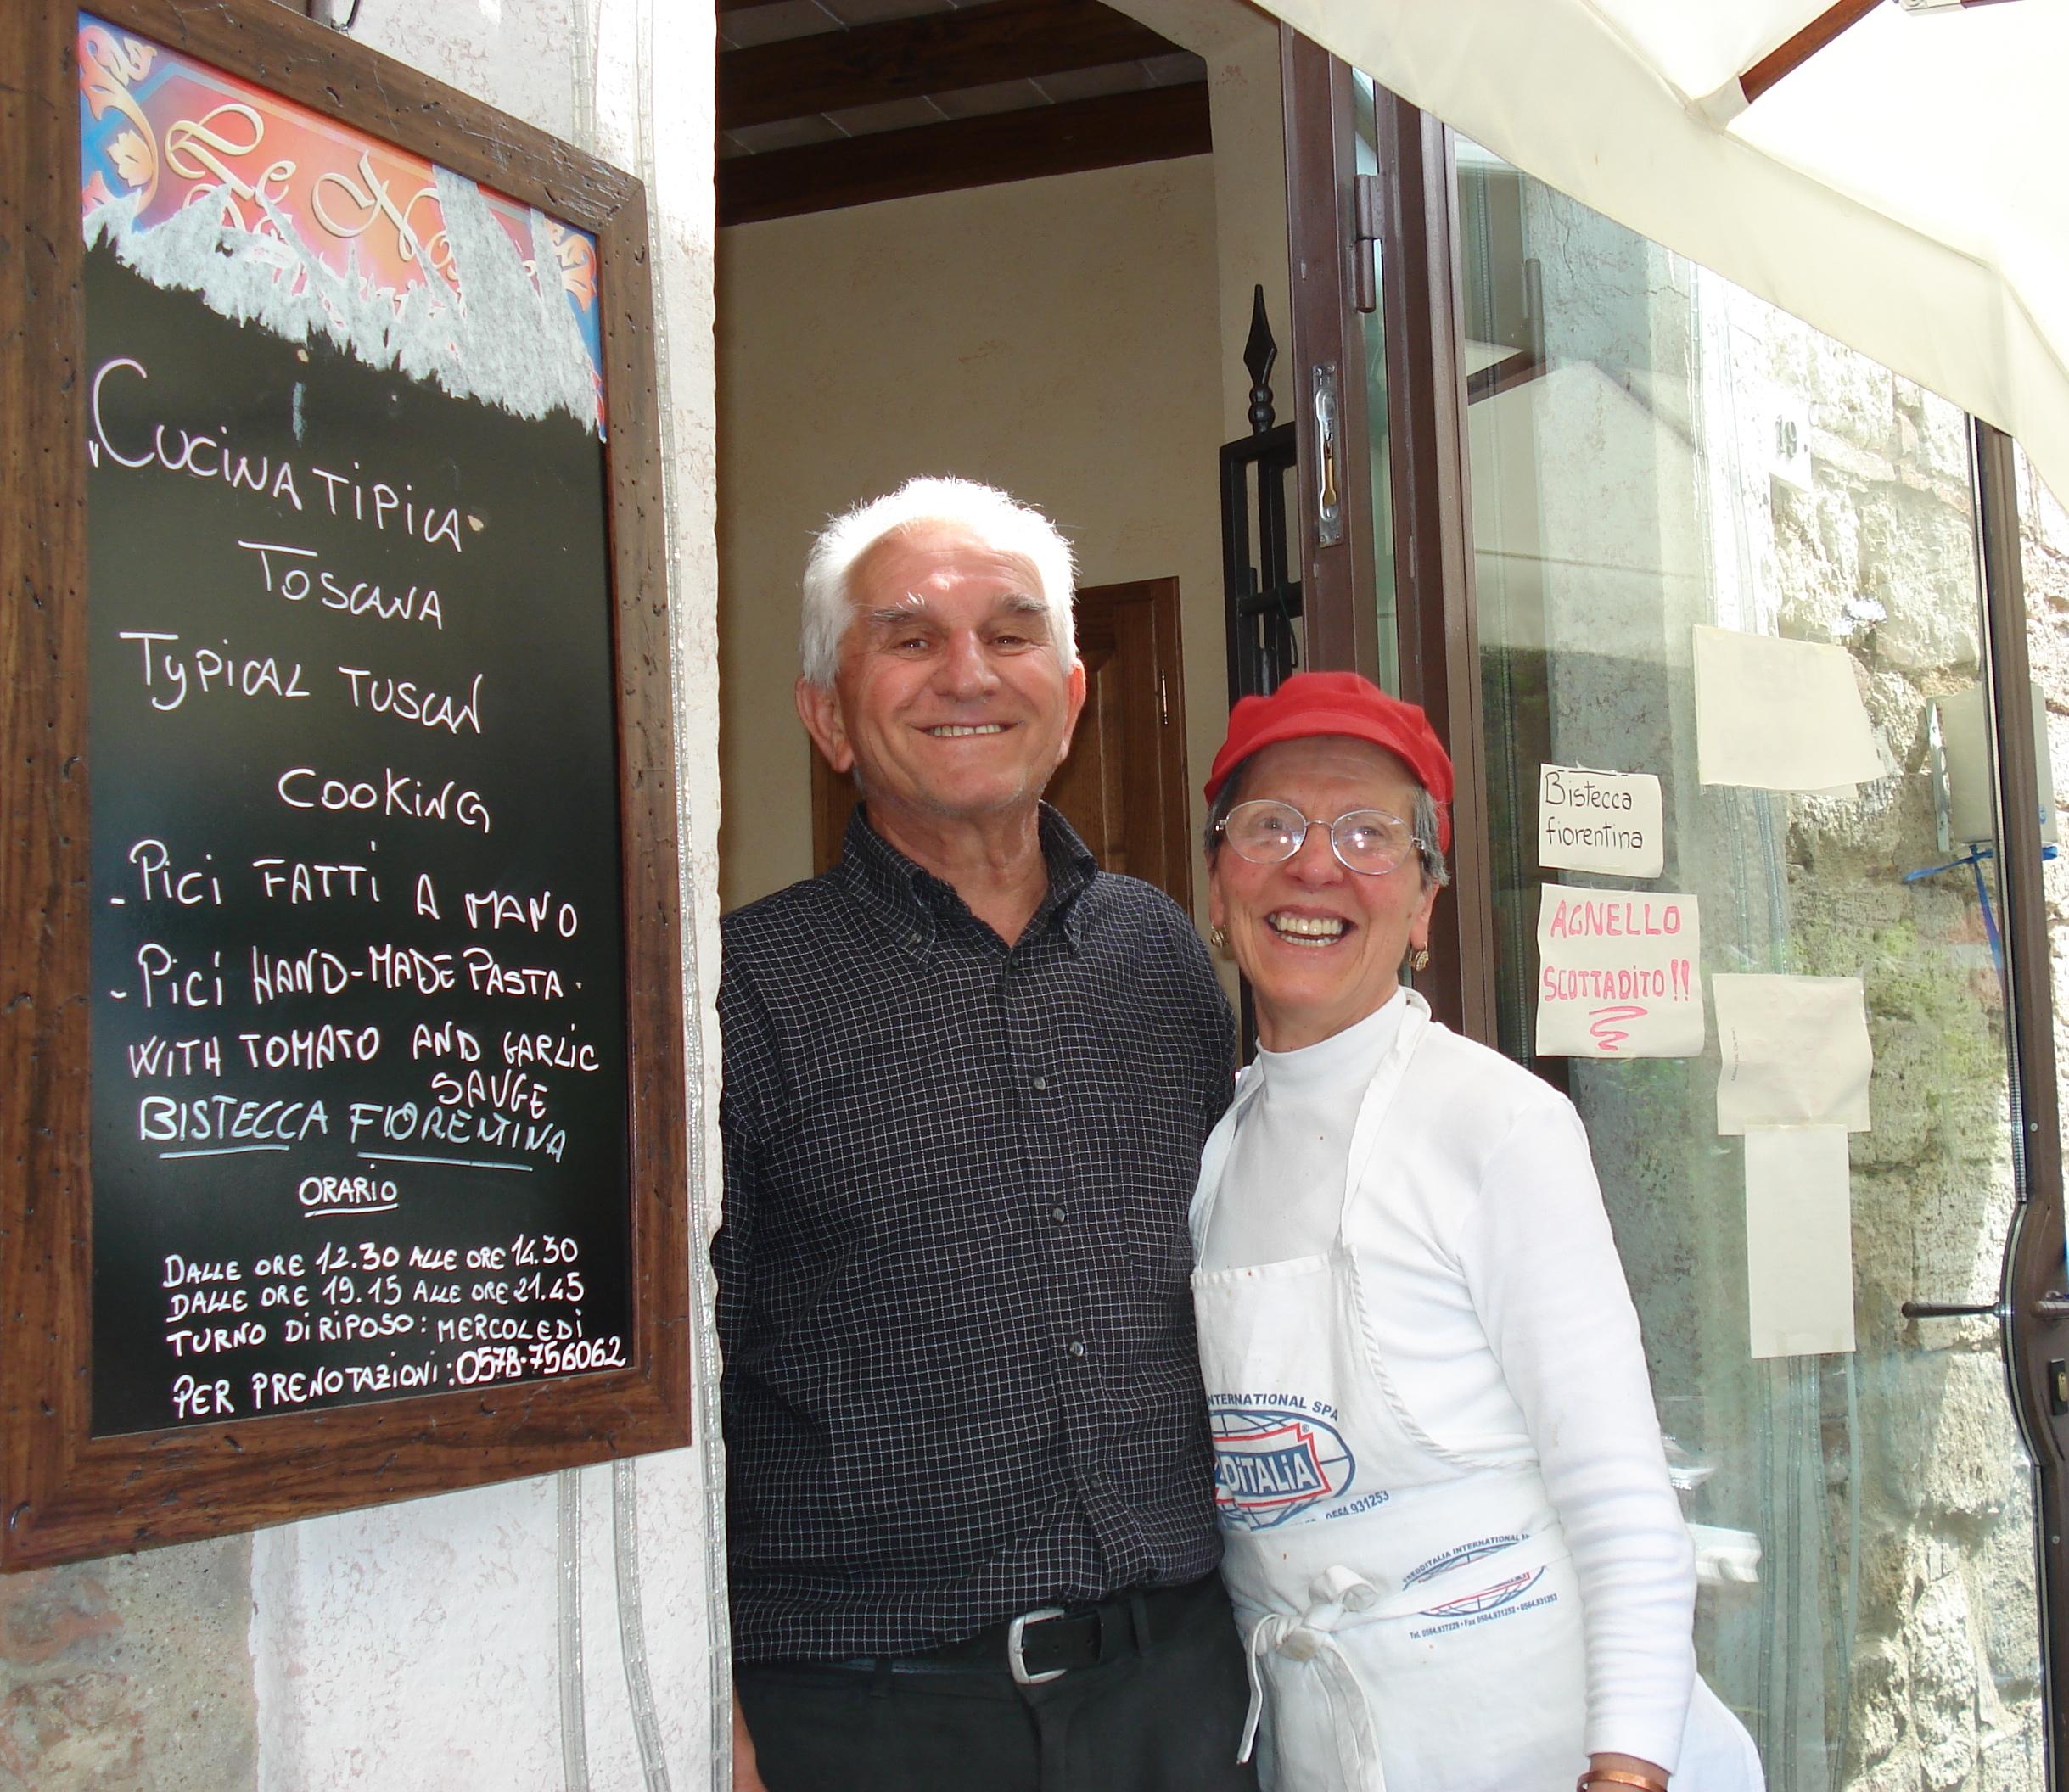 tuscany-osteria- montepuliciano.JPG